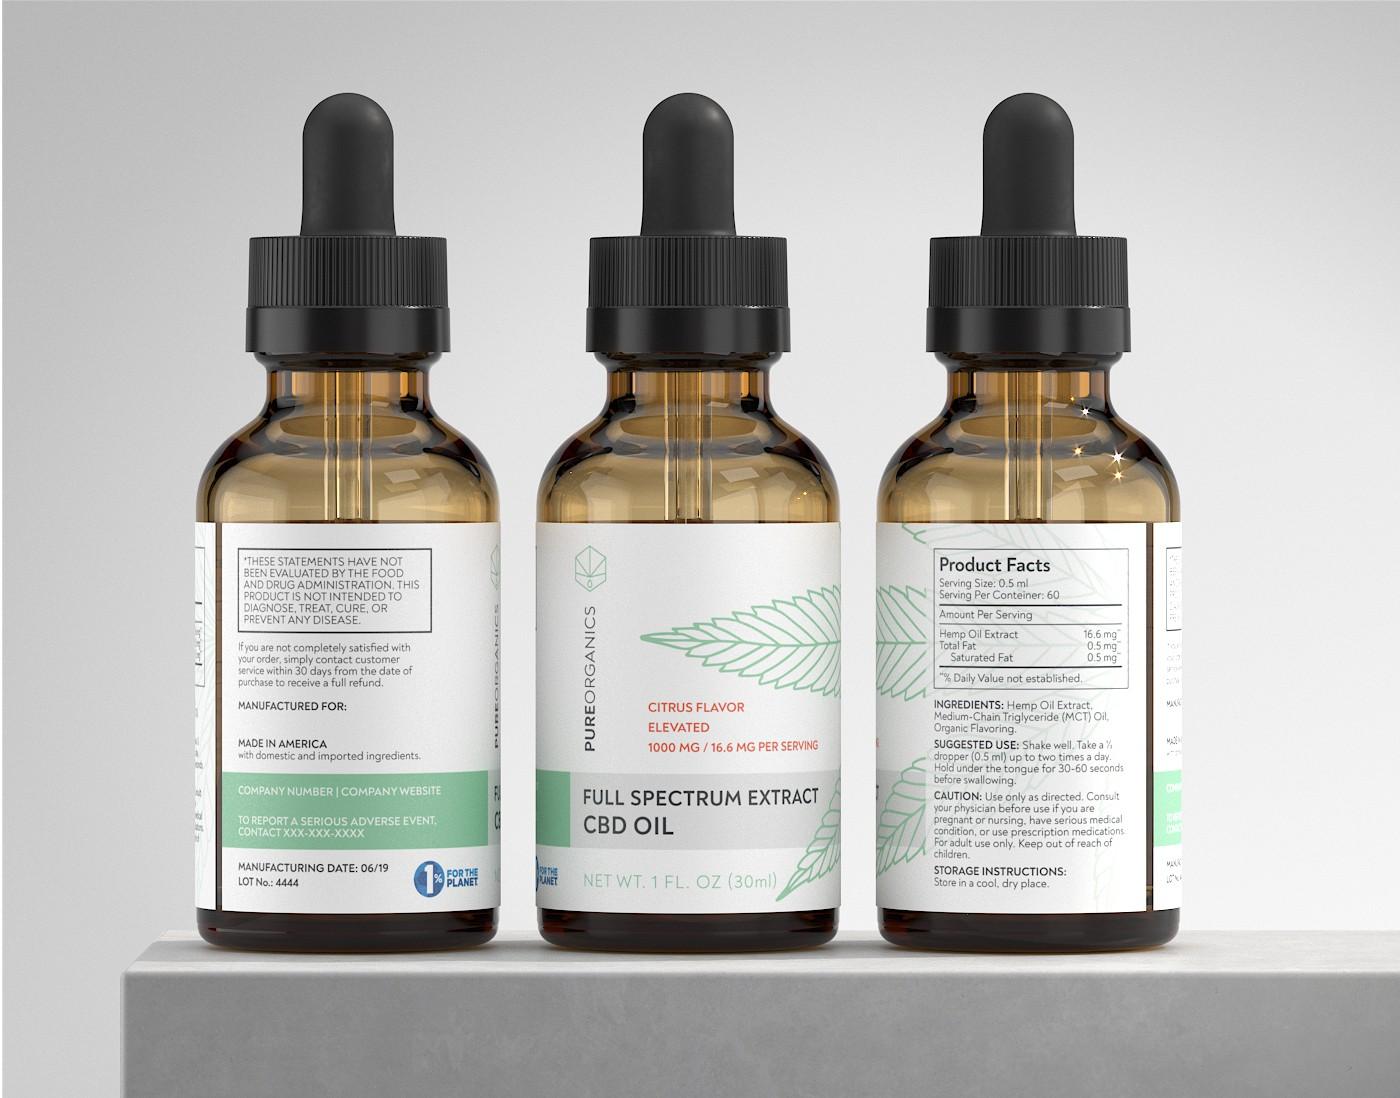 Modern CBD/Hemp packaging/brand needed